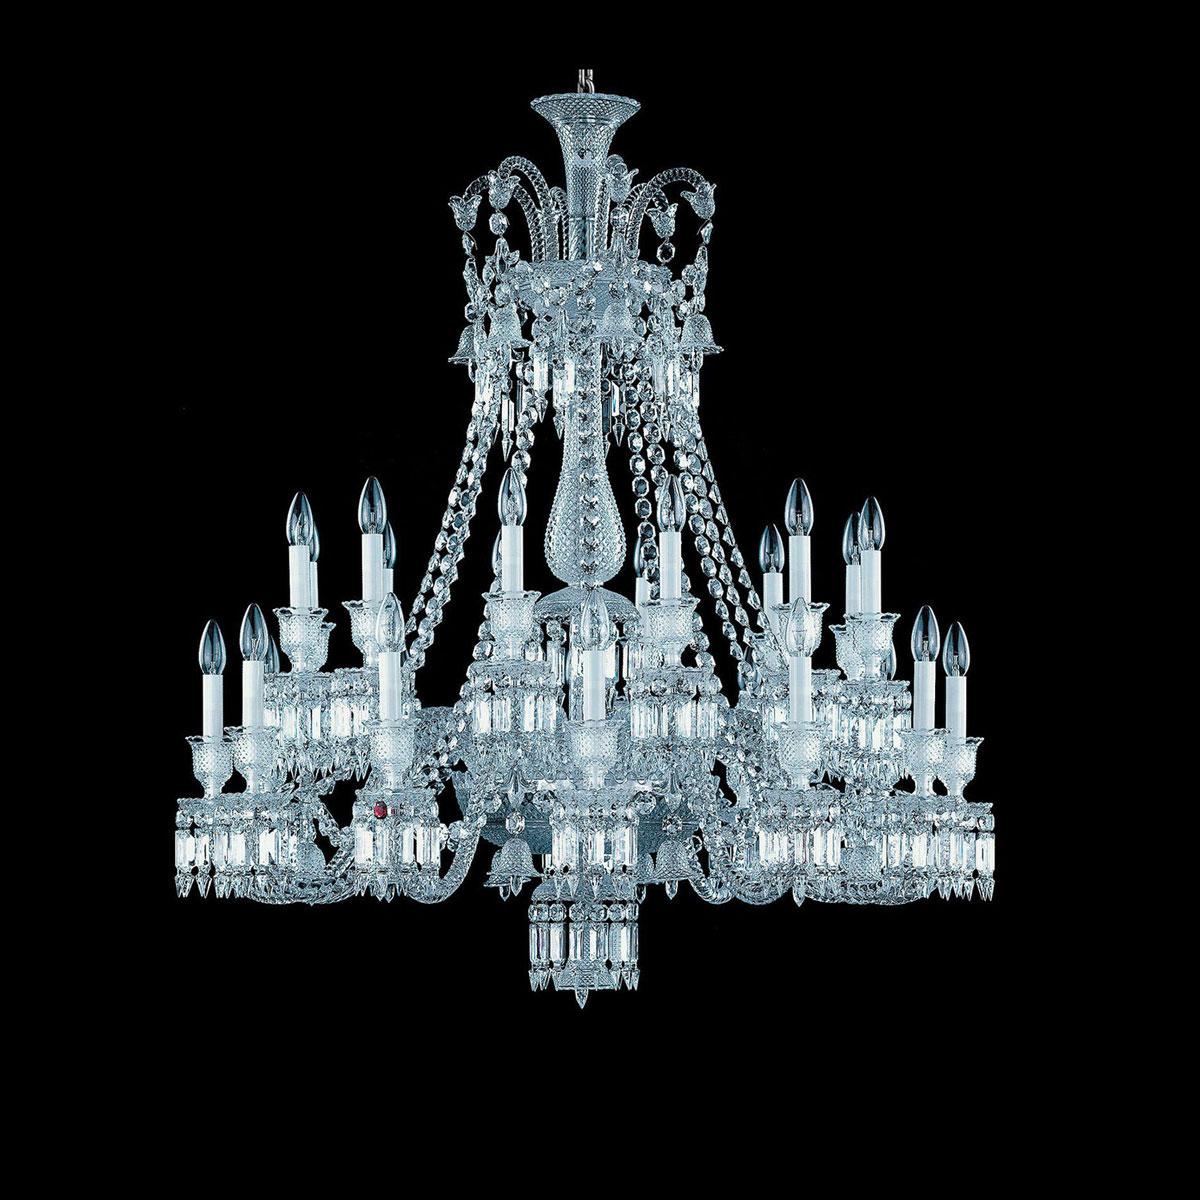 Baccarat Crystal, Zenith Crystal Chandelier, 24 Light